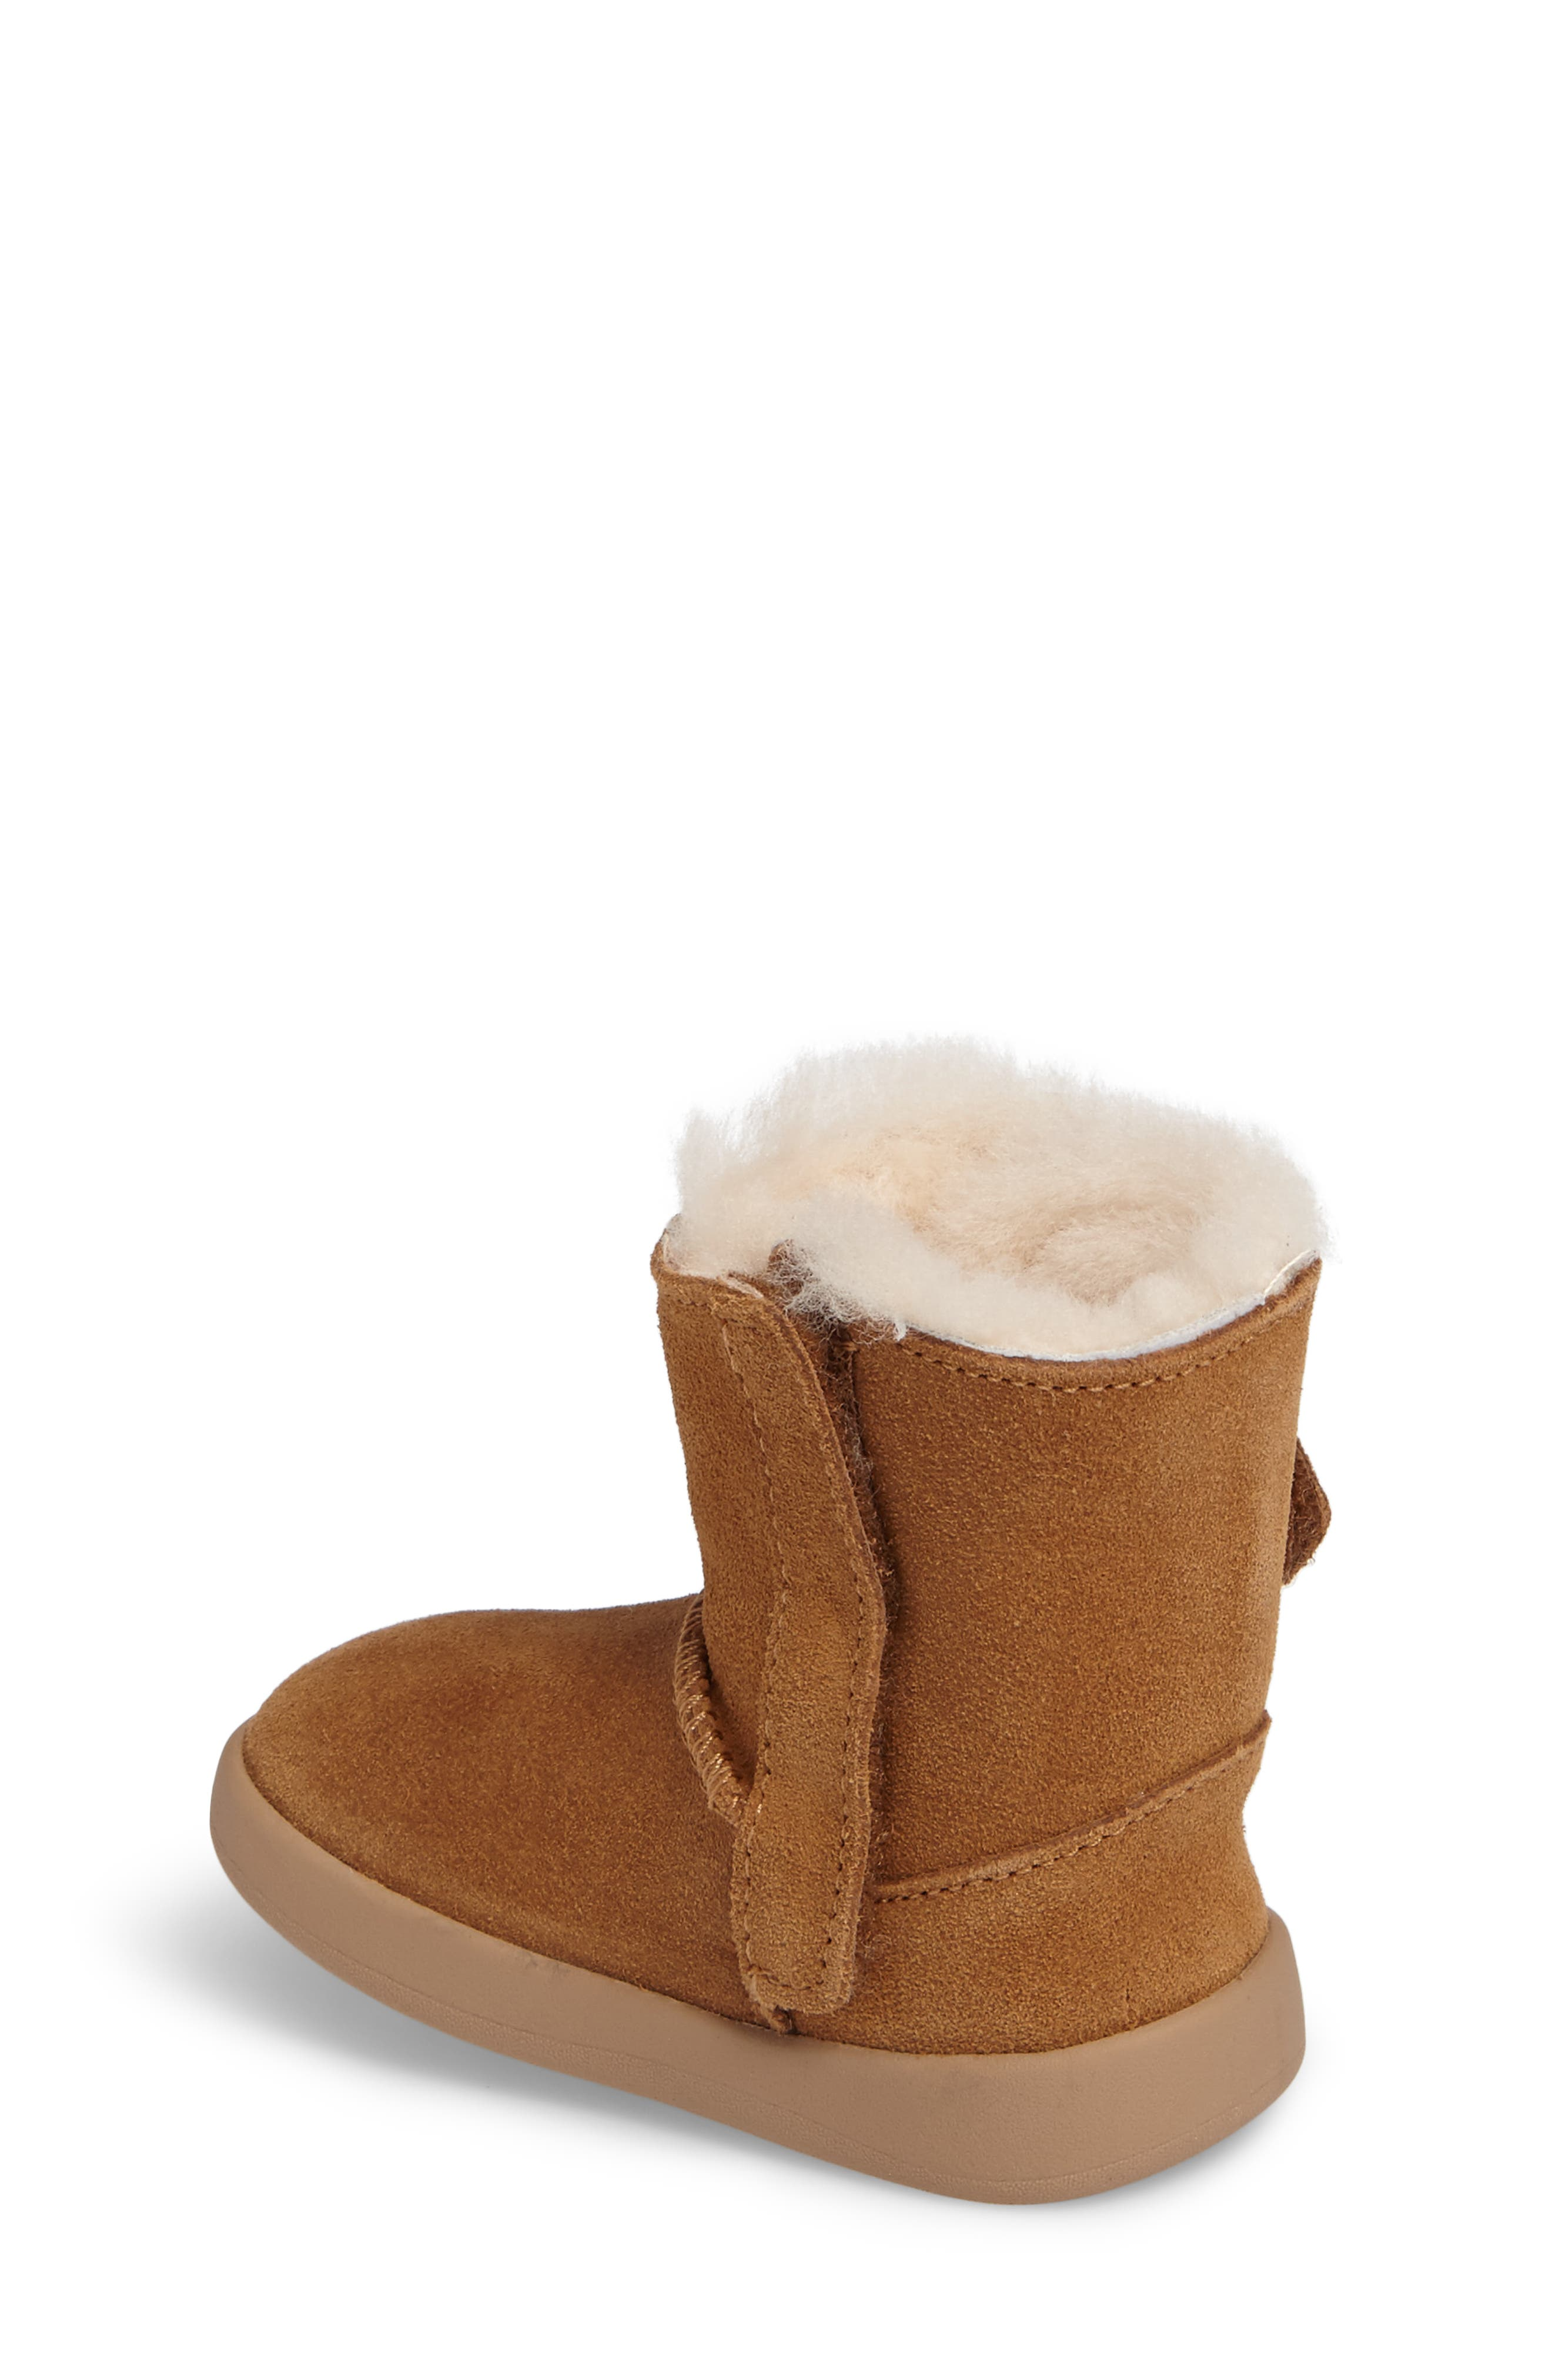 Keelan Genuine Shearling Baby Boot,                             Alternate thumbnail 2, color,                             CHESTNUT BROWN